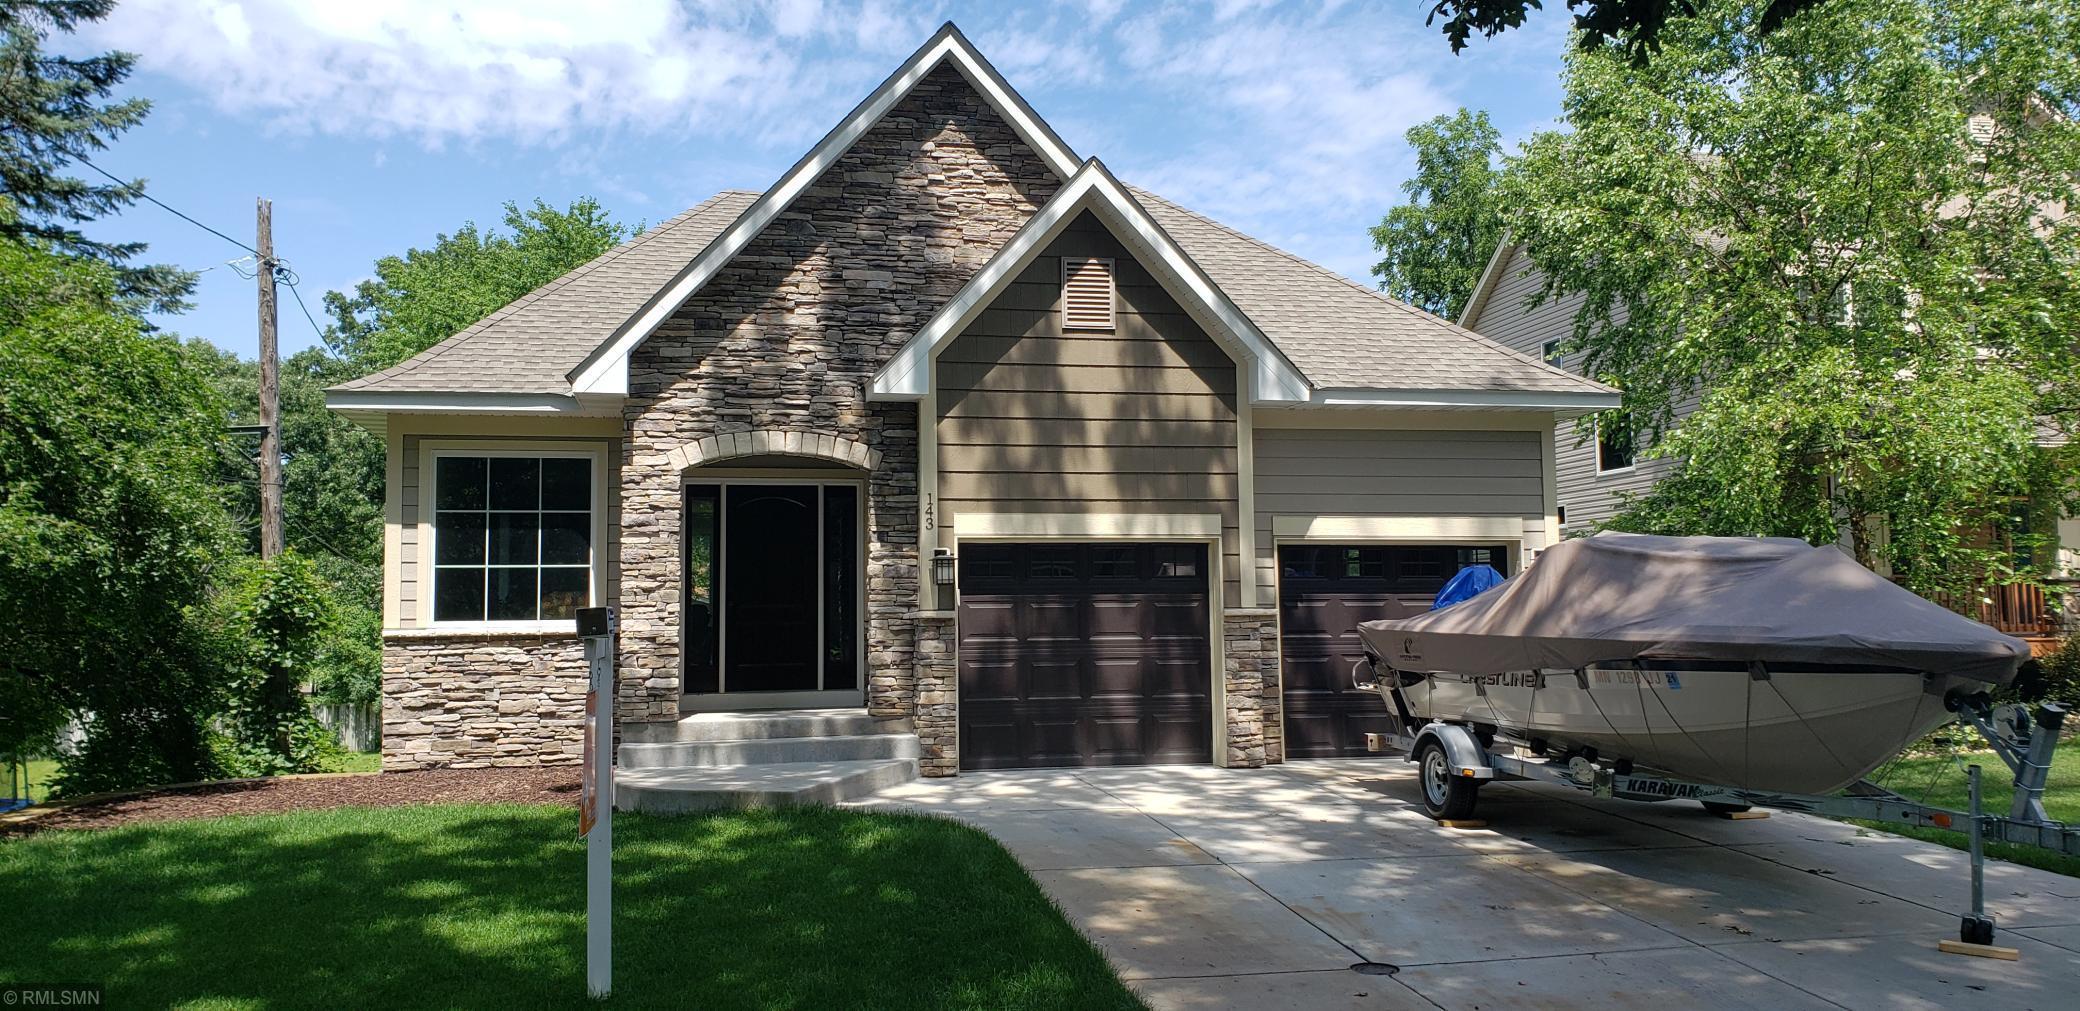 143 Ivy Property Photo - Mahtomedi, MN real estate listing